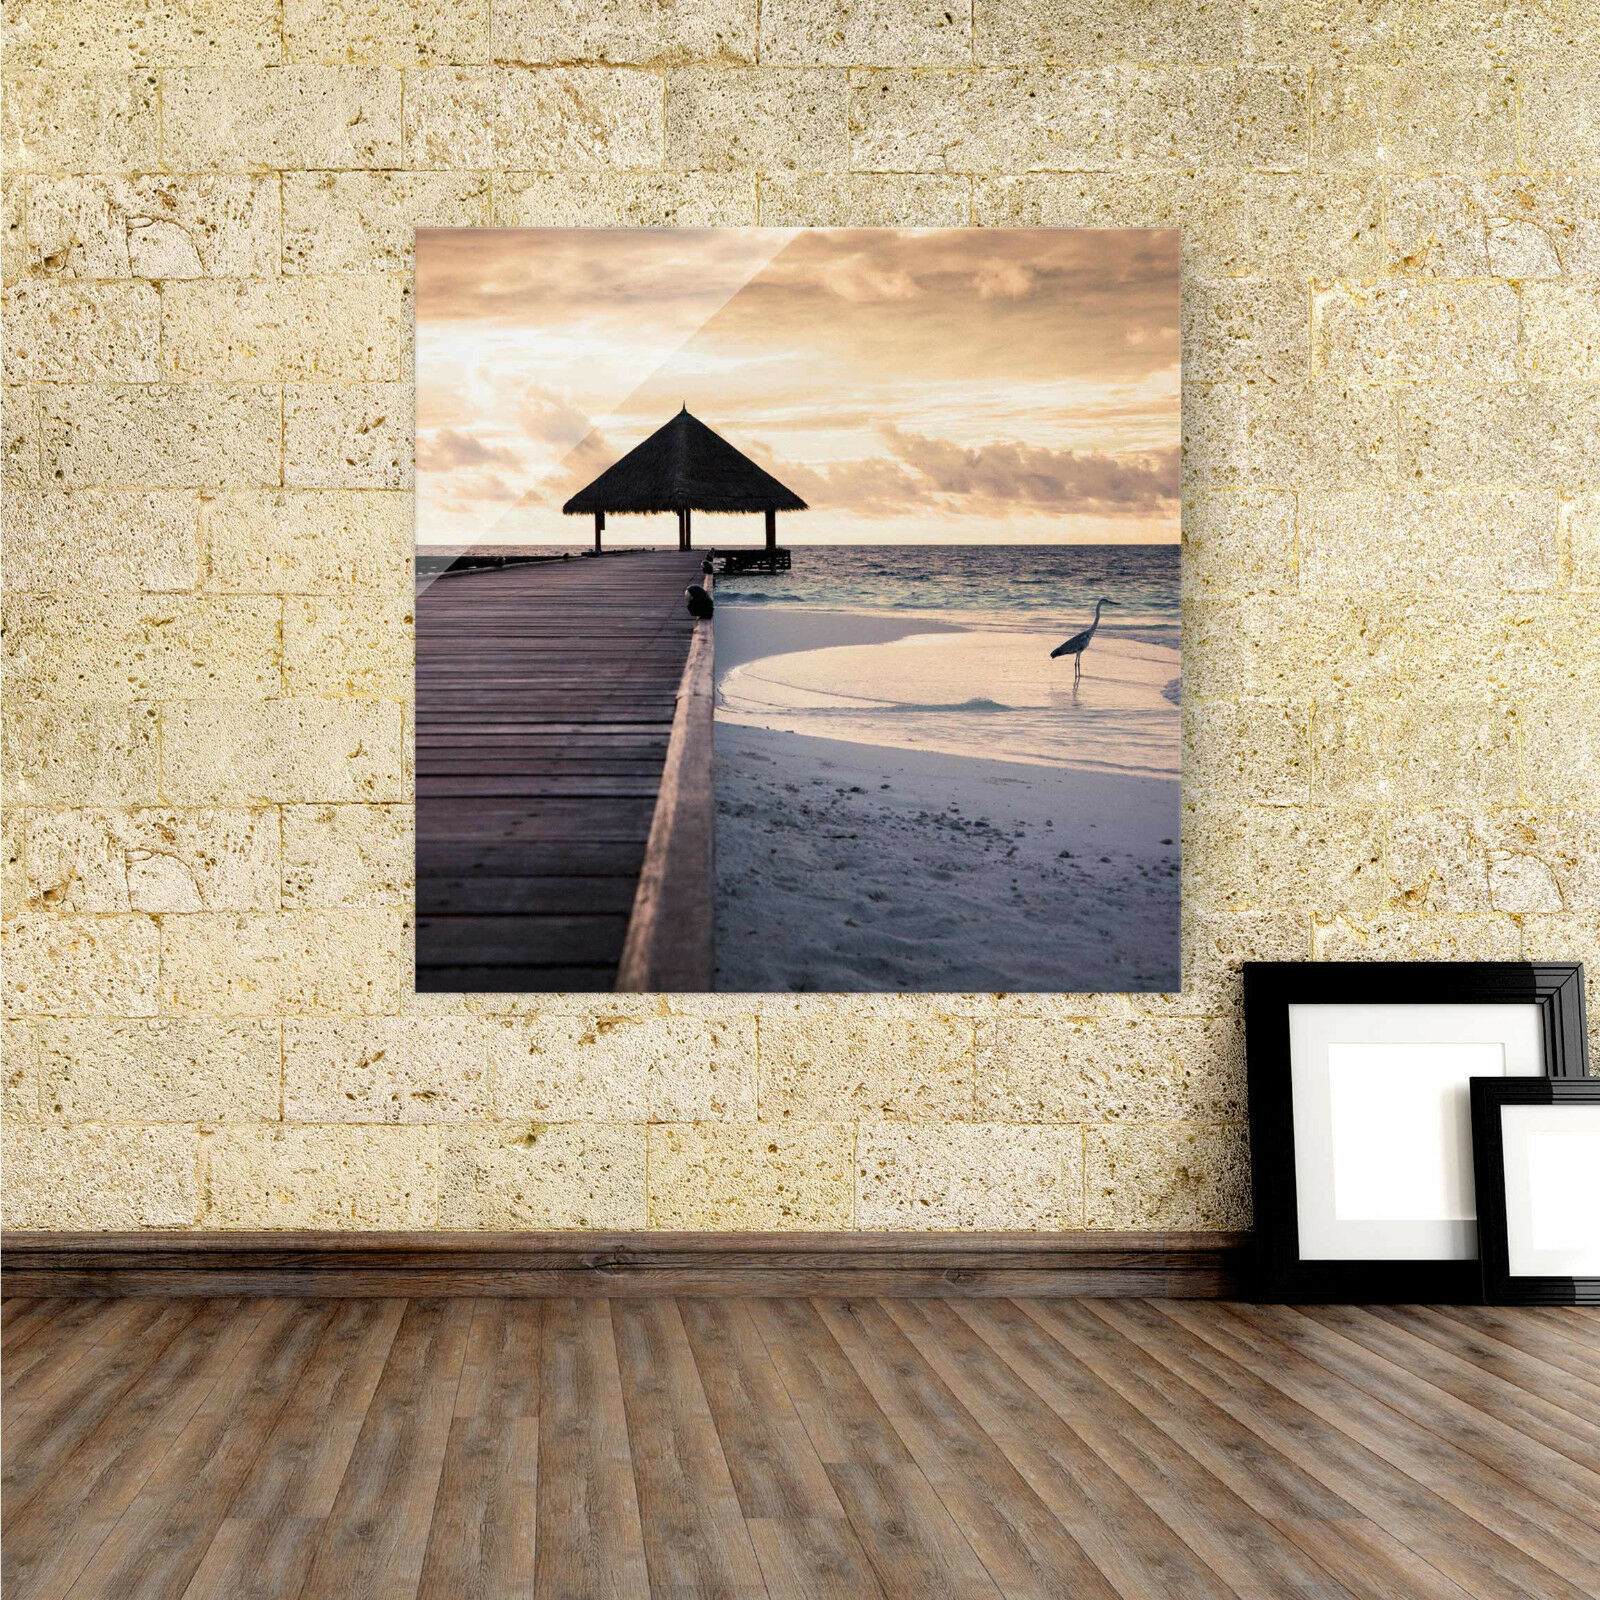 Acrylbild Acryl Glas Bild Wandbild Plexiglas Meer Natur Romantik Strand Meer